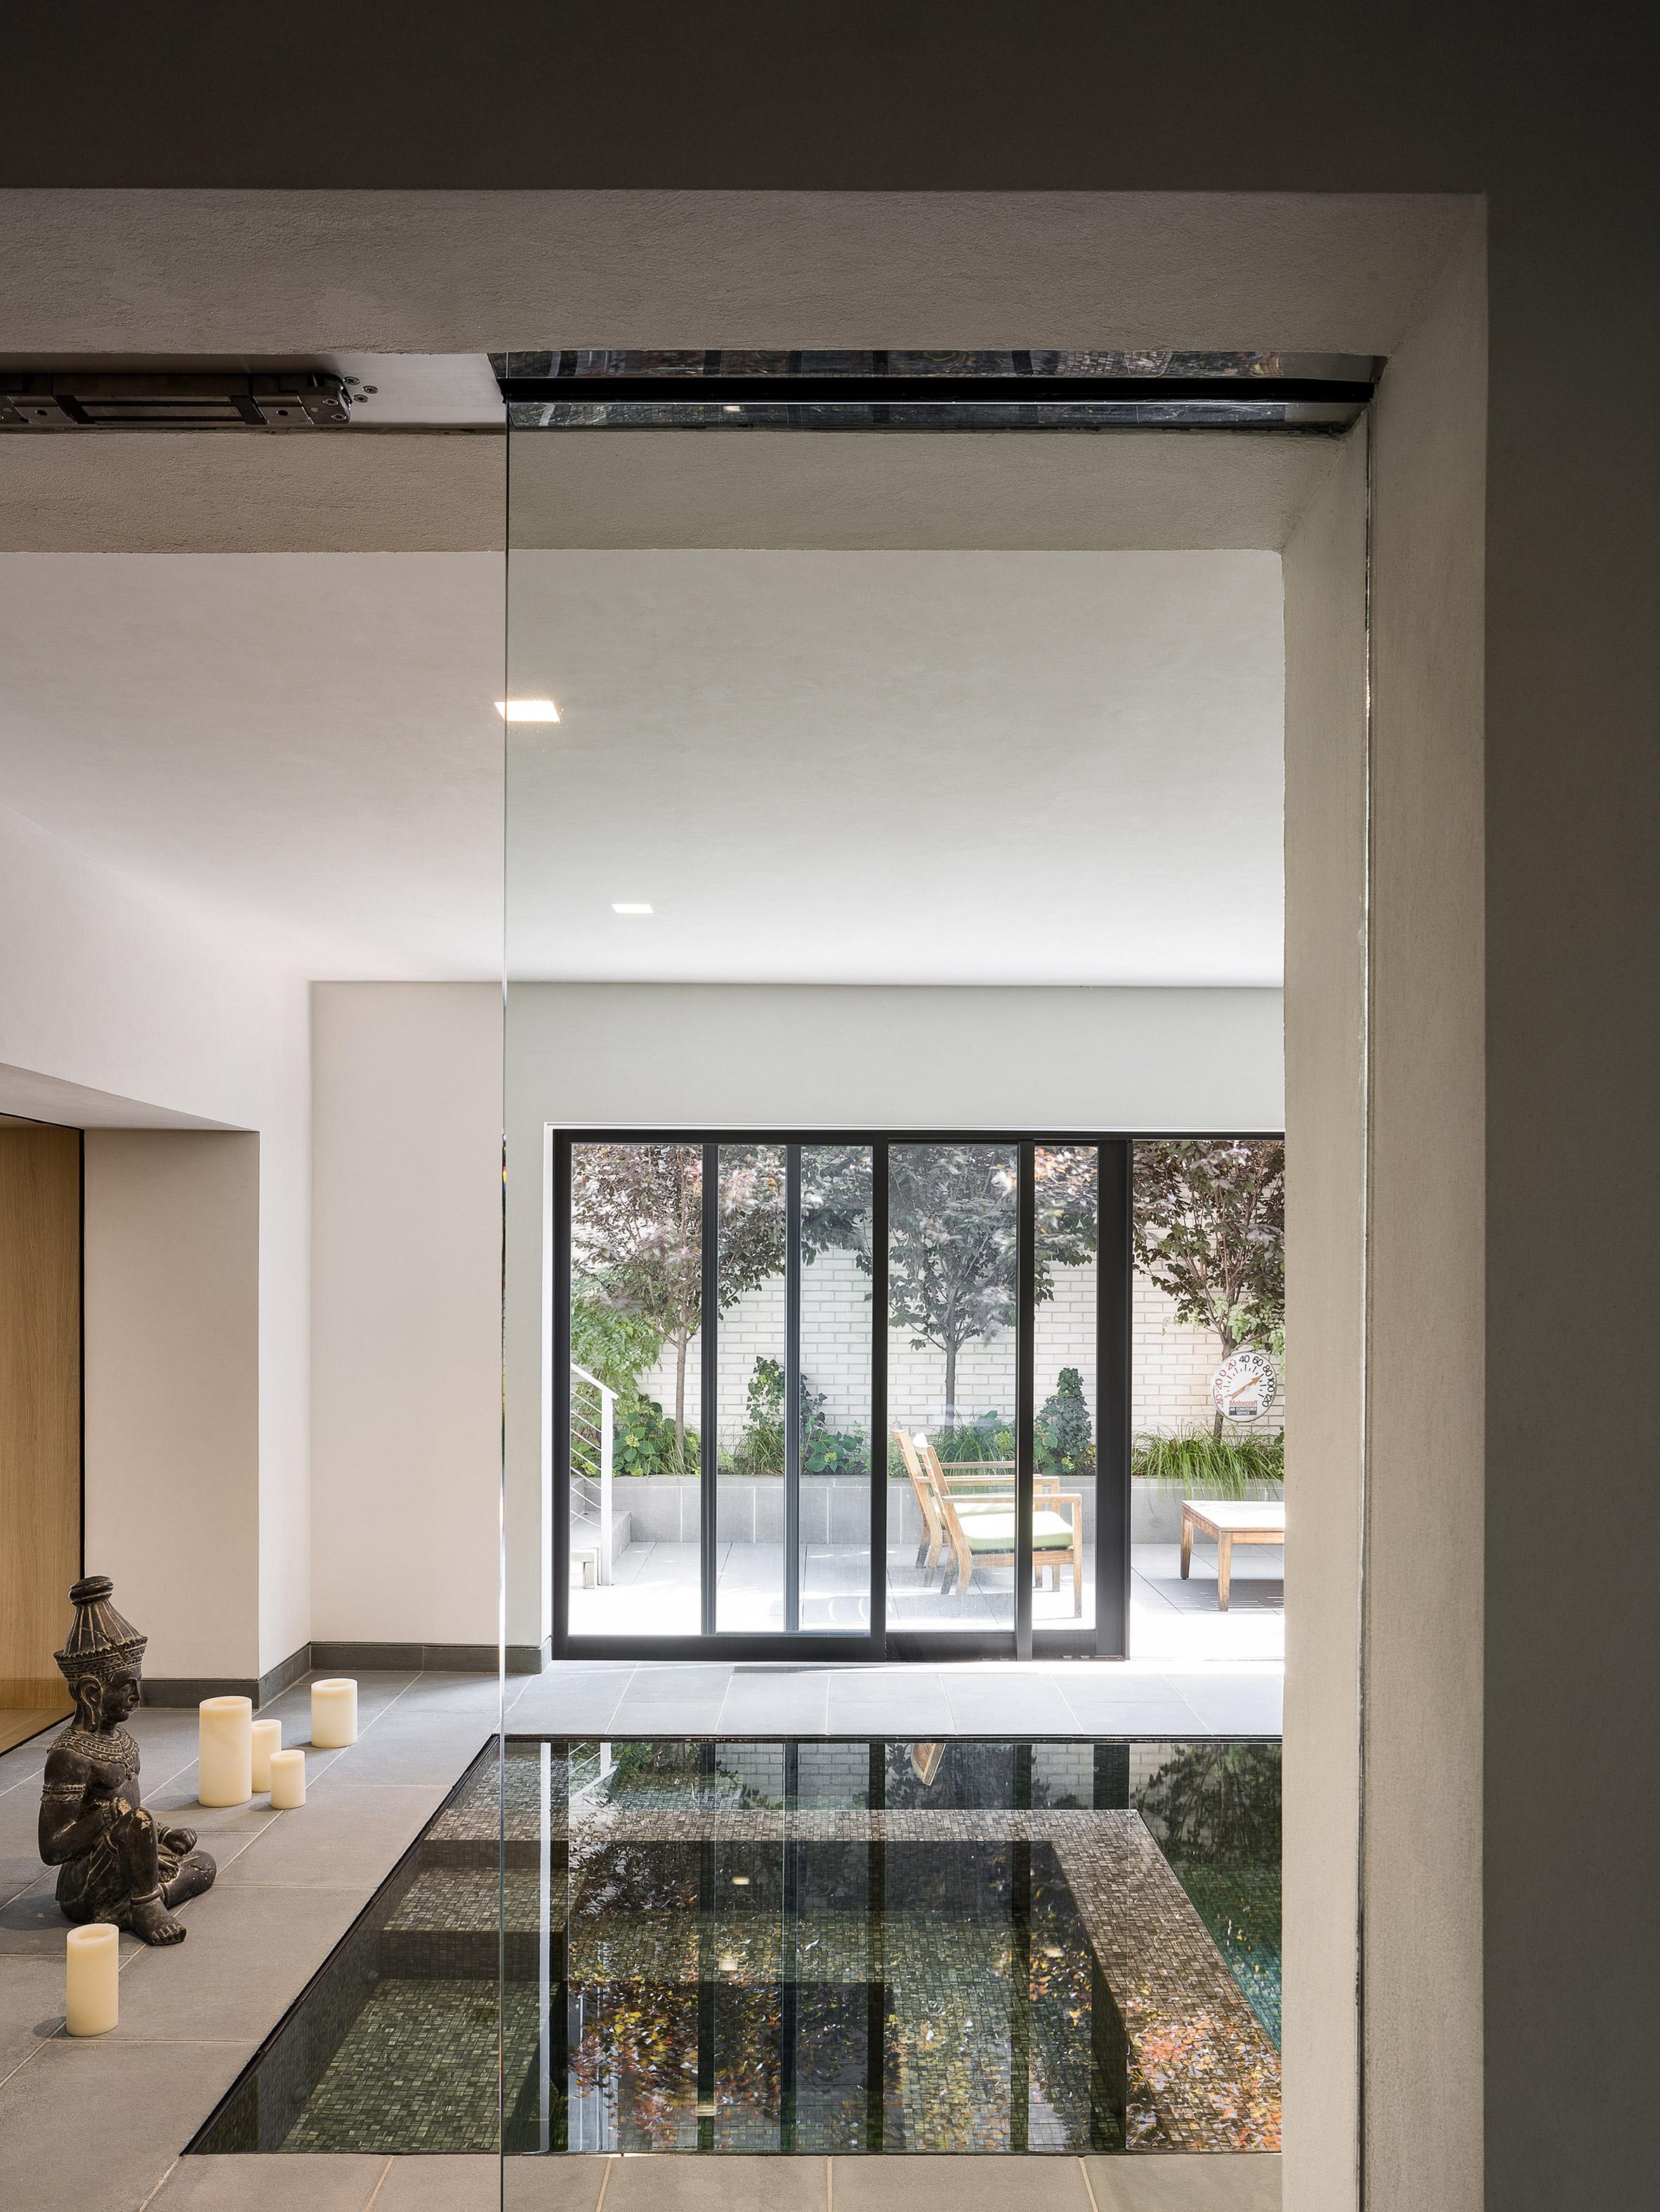 paulus-hook-residence-fogarty-finger-interiors-new-jersey-usa_dezeen_2364_col_12.jpg